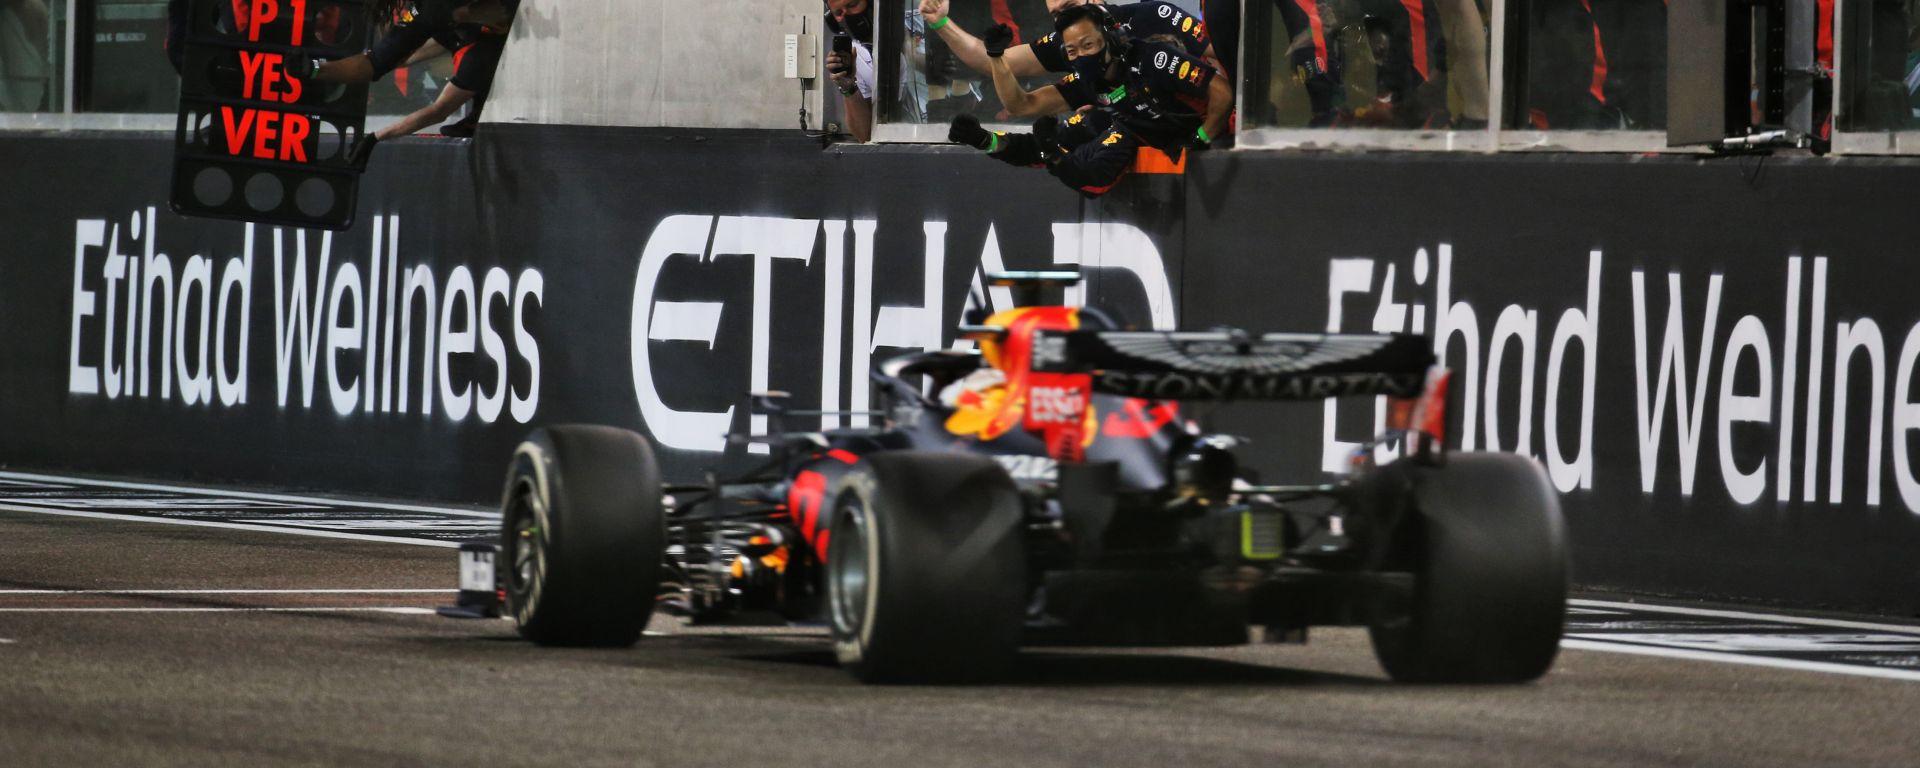 F1 GP Abu Dhabi 2020, Yas Marina: Max Verstappen (Red Bull Racing) taglia il traguardo